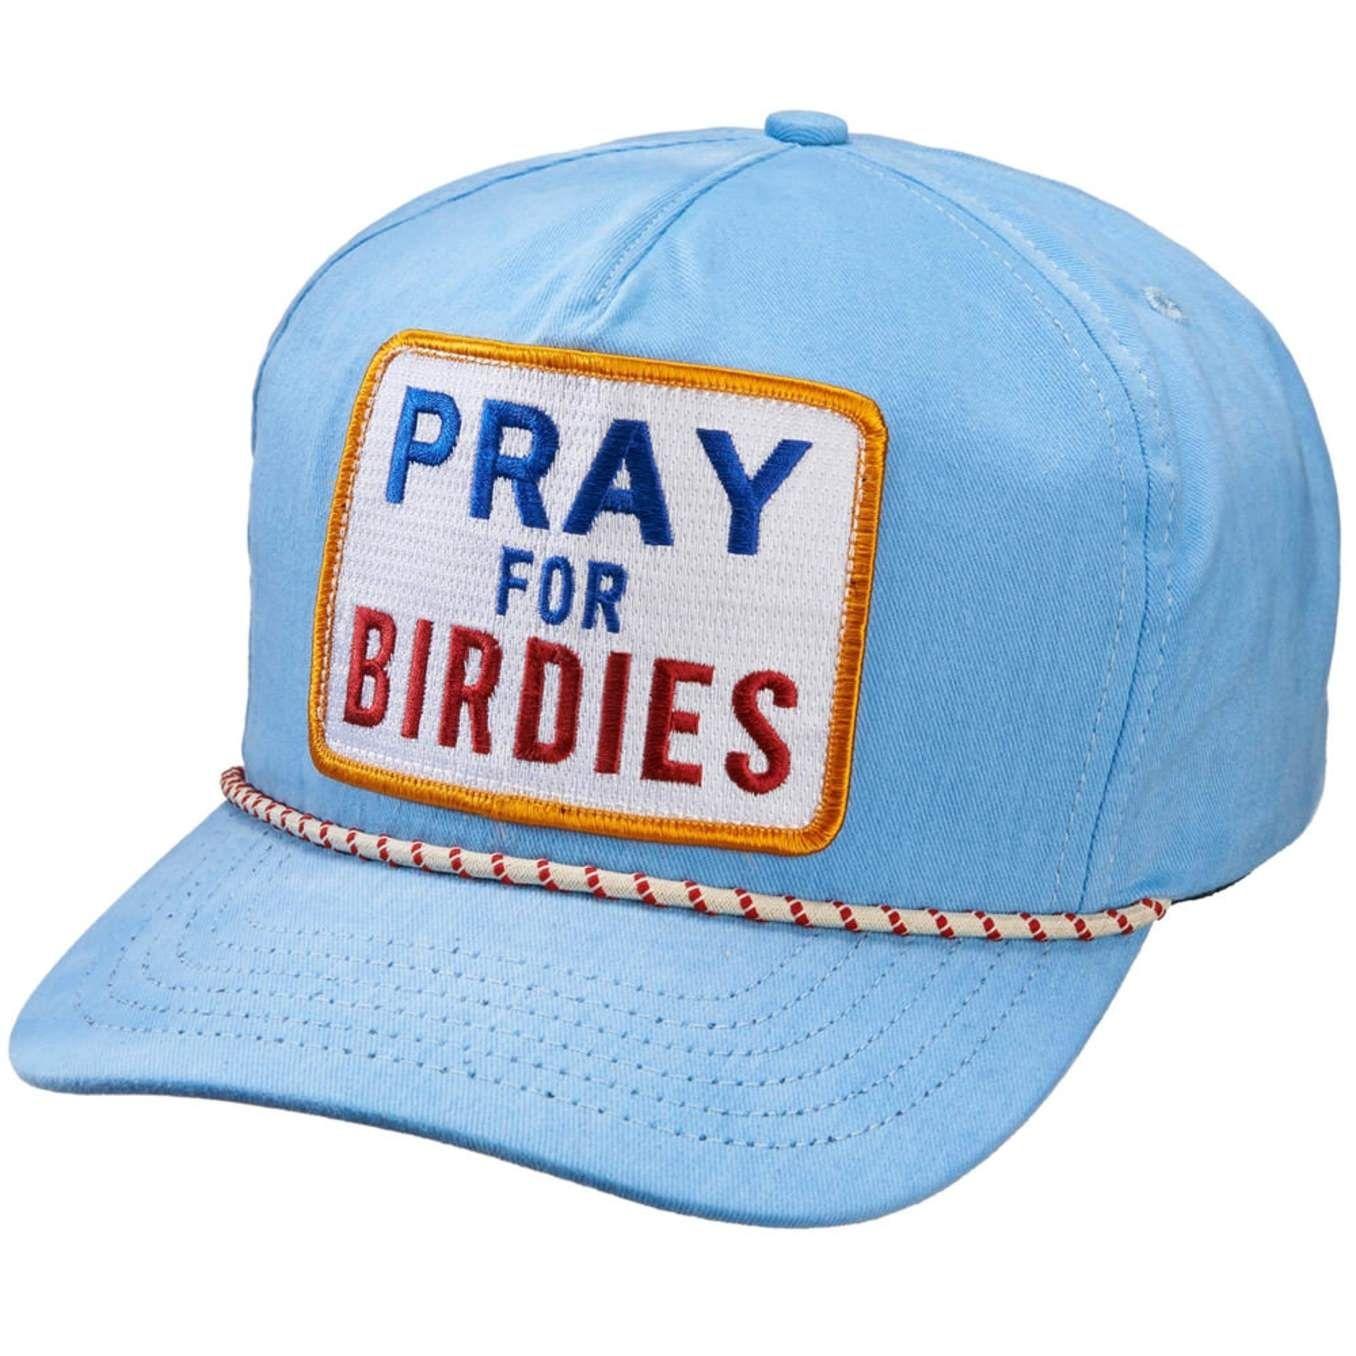 fc3493b5 Pray for Birdies Strap Back Cap Sky - 2016 | Jeremy Mitchell | Hats ...